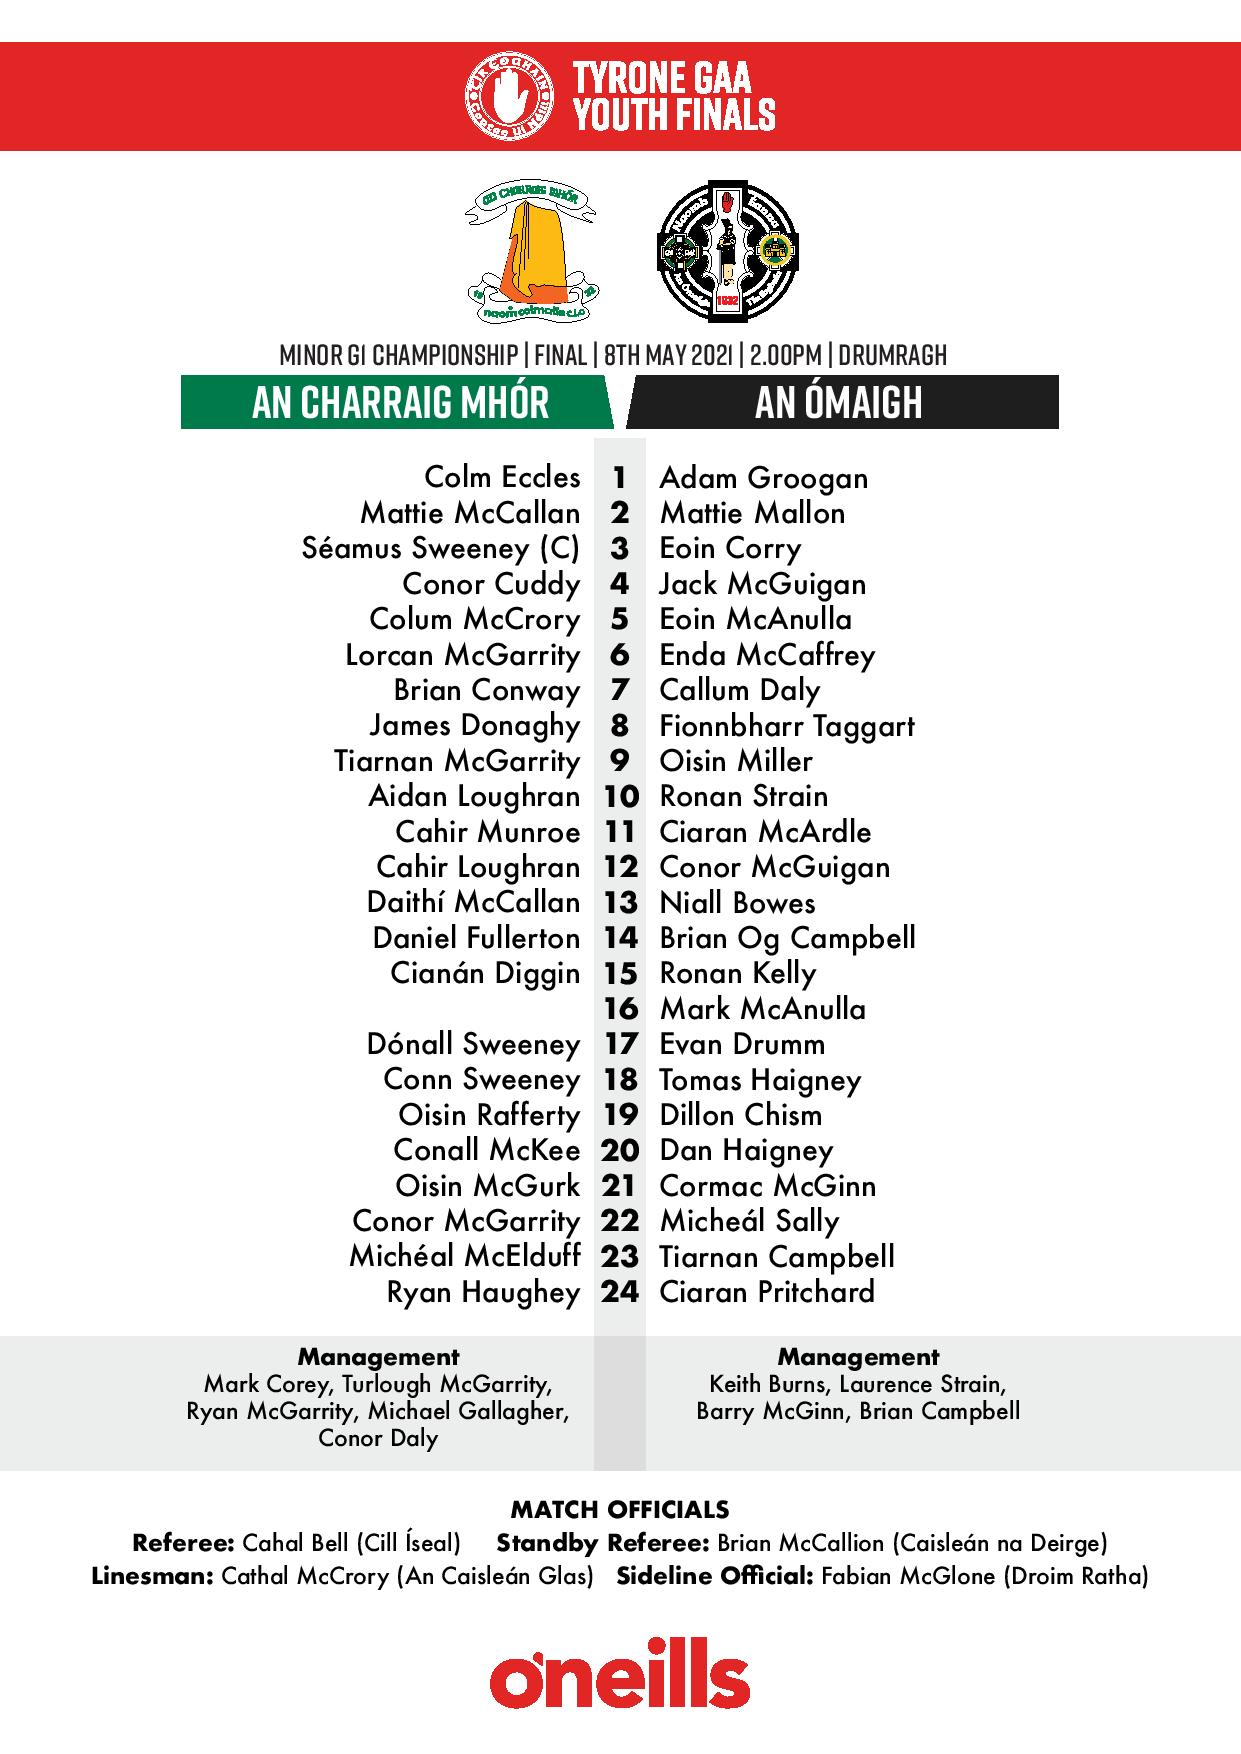 Tyrone GAA Youth Finals match programmes online